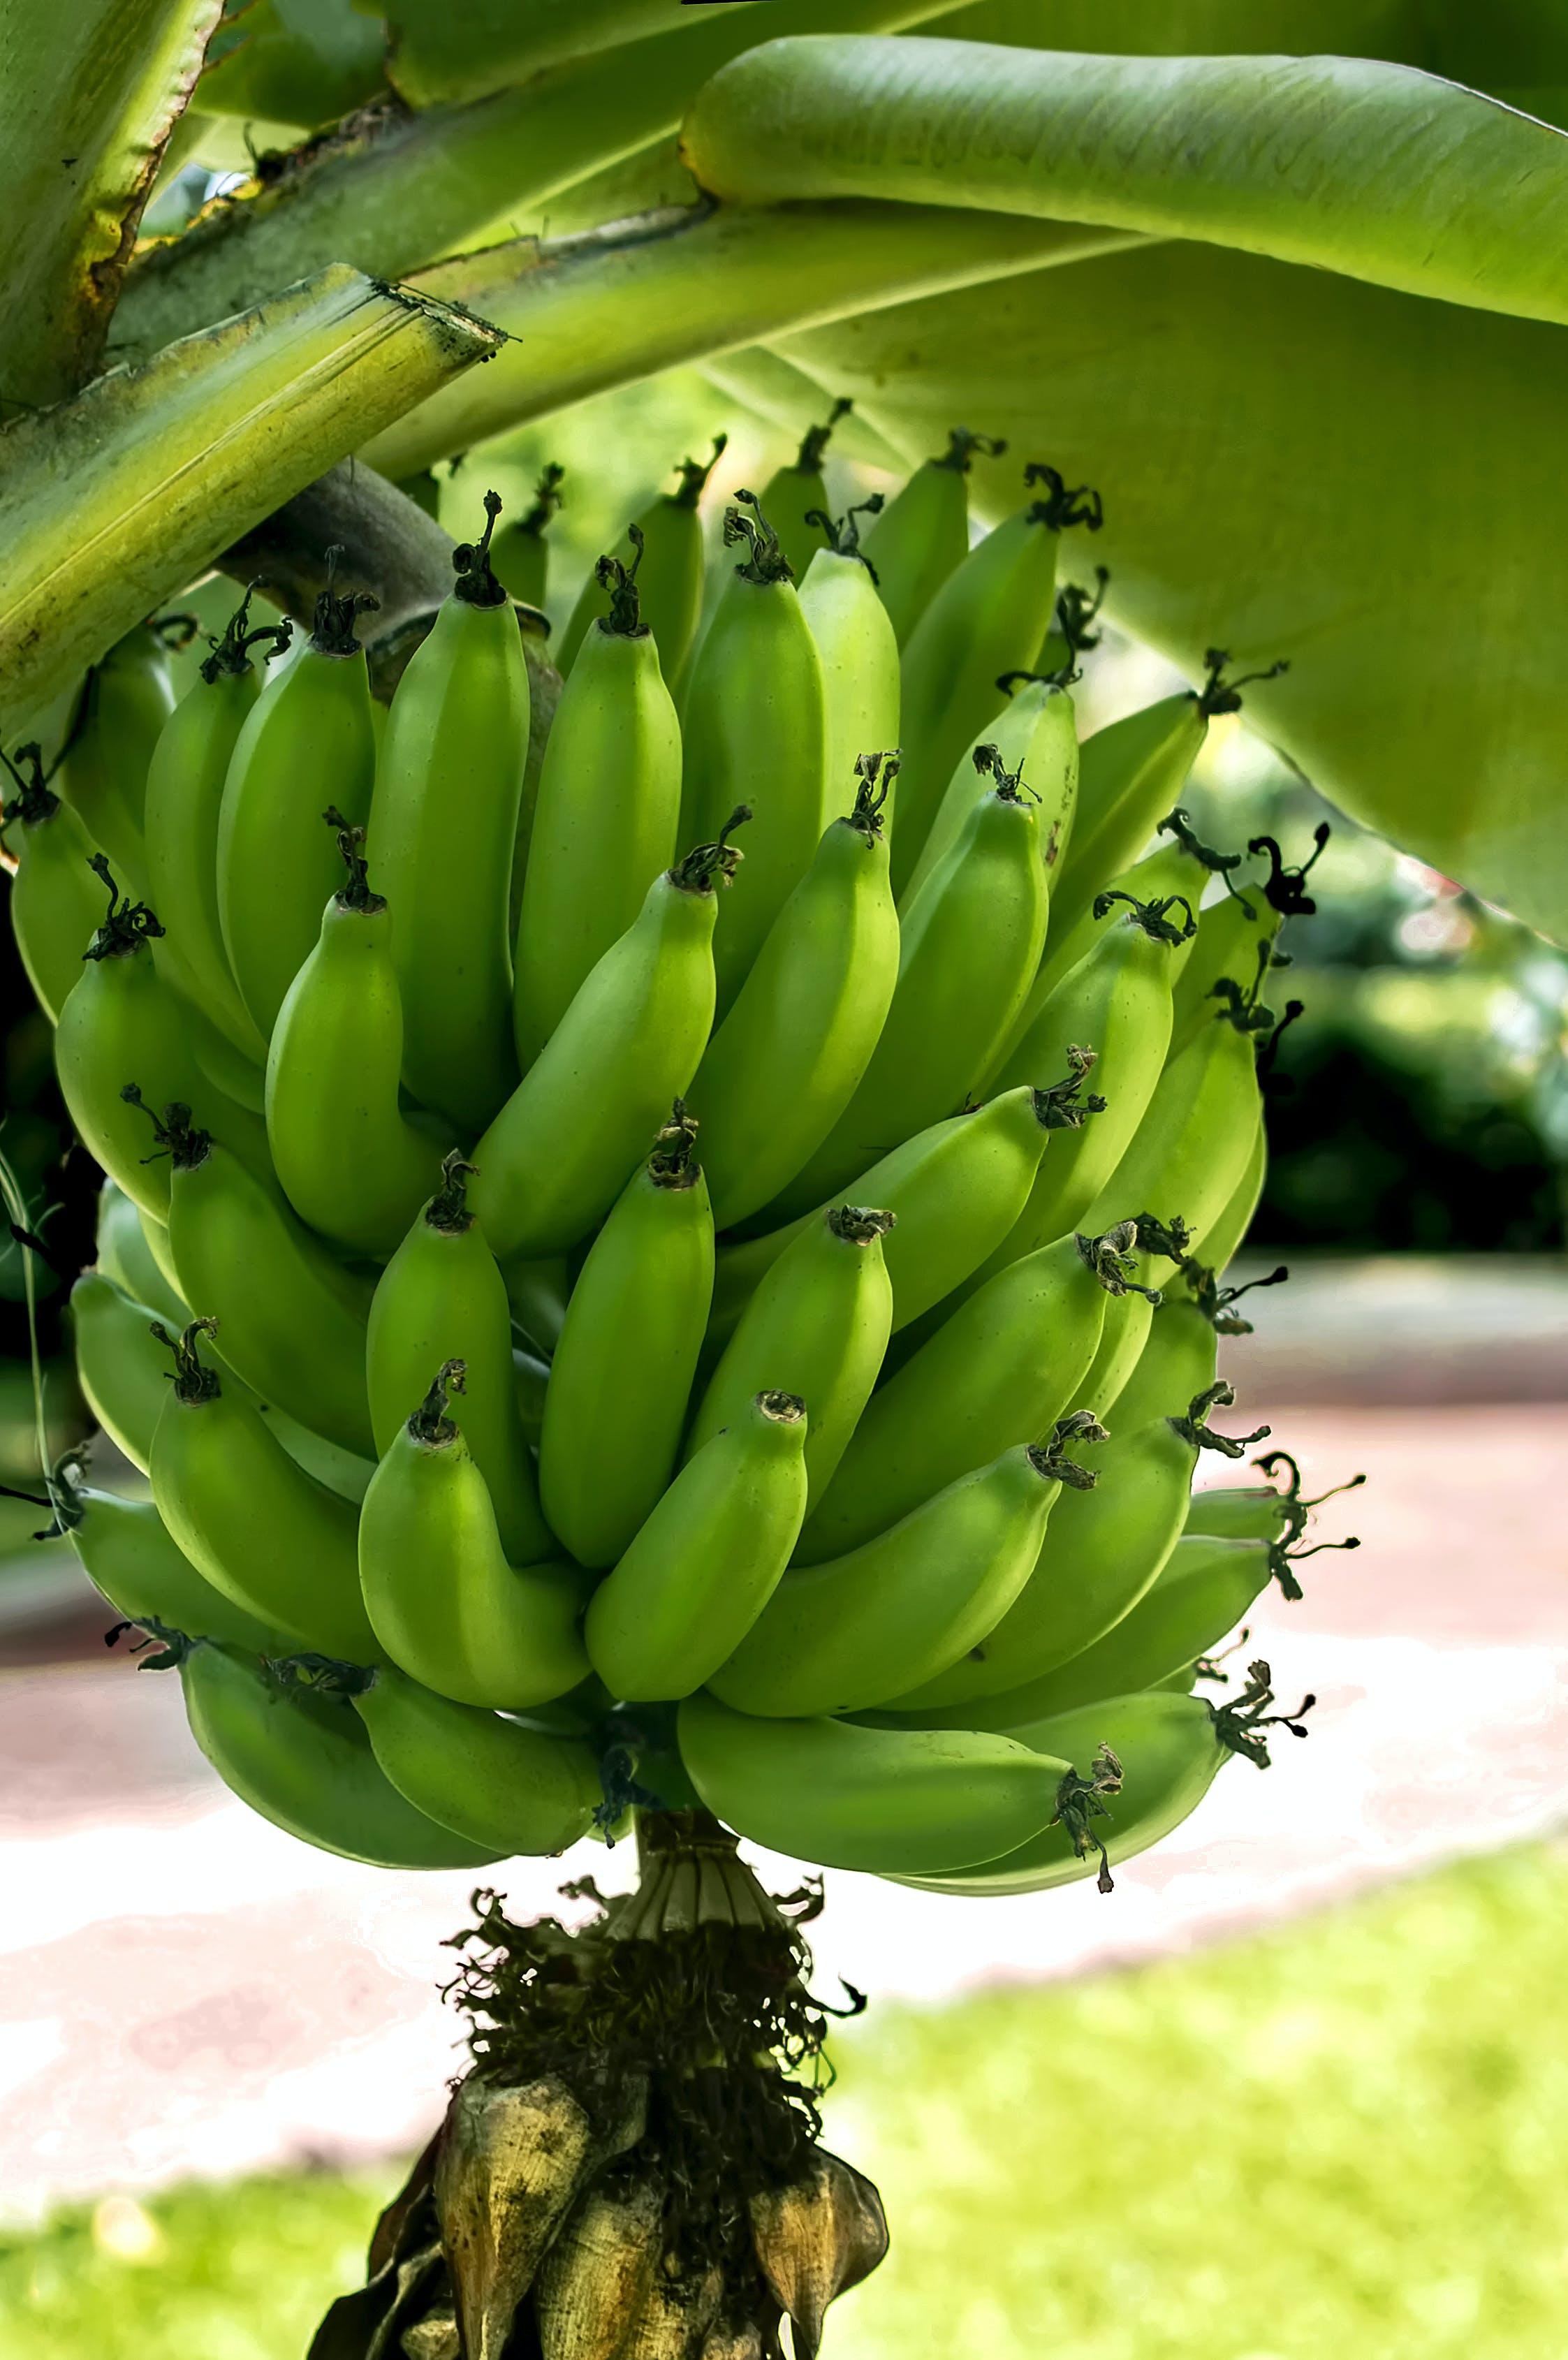 Free stock photo of bananas, bananos, colombia, Colombian